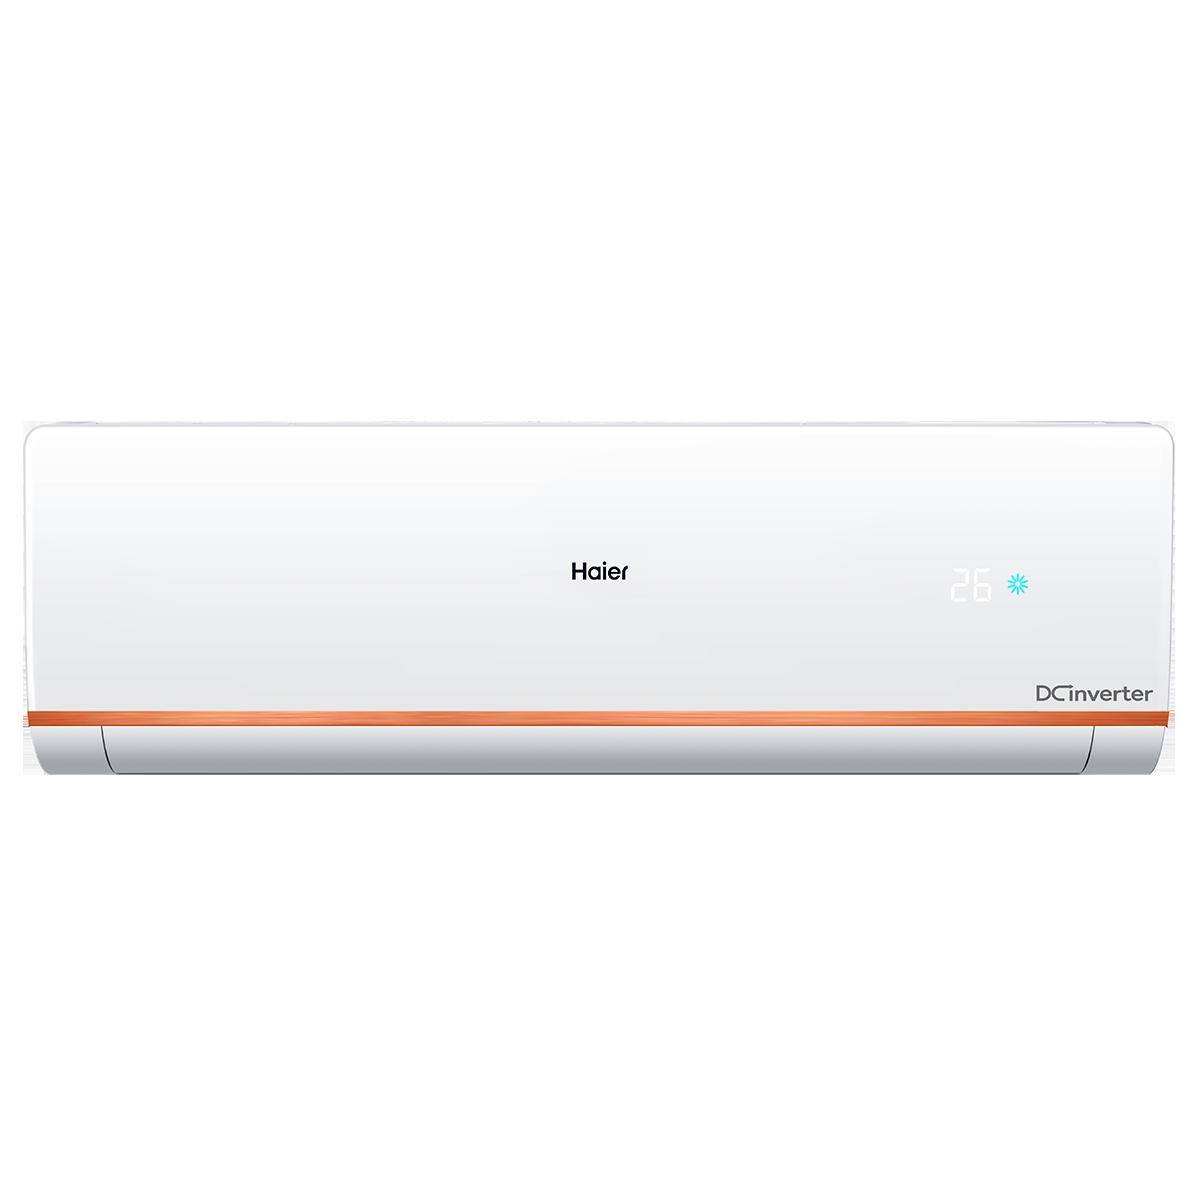 Haier CleanCool Kuadra 1.5 Ton 4 Star Inverter Split AC (2 Row Copper Tube Condenser, HSU18C-NCB4B(INV), White)